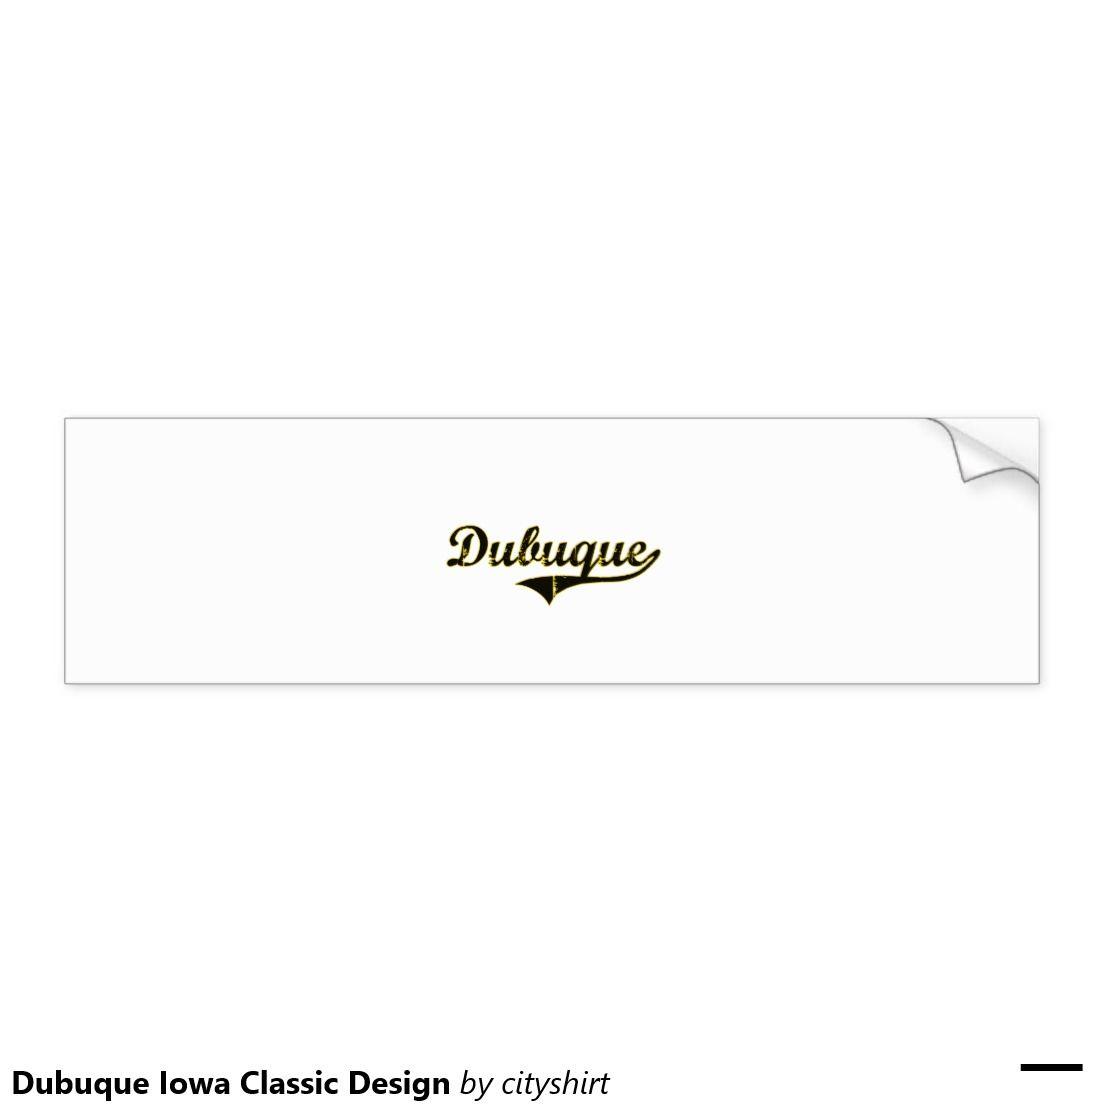 Dubuque Iowa Classic Design Bumper Sticker Zazzle Com Bumper Stickers Car Bumper Stickers Classic Design [ 1104 x 1104 Pixel ]